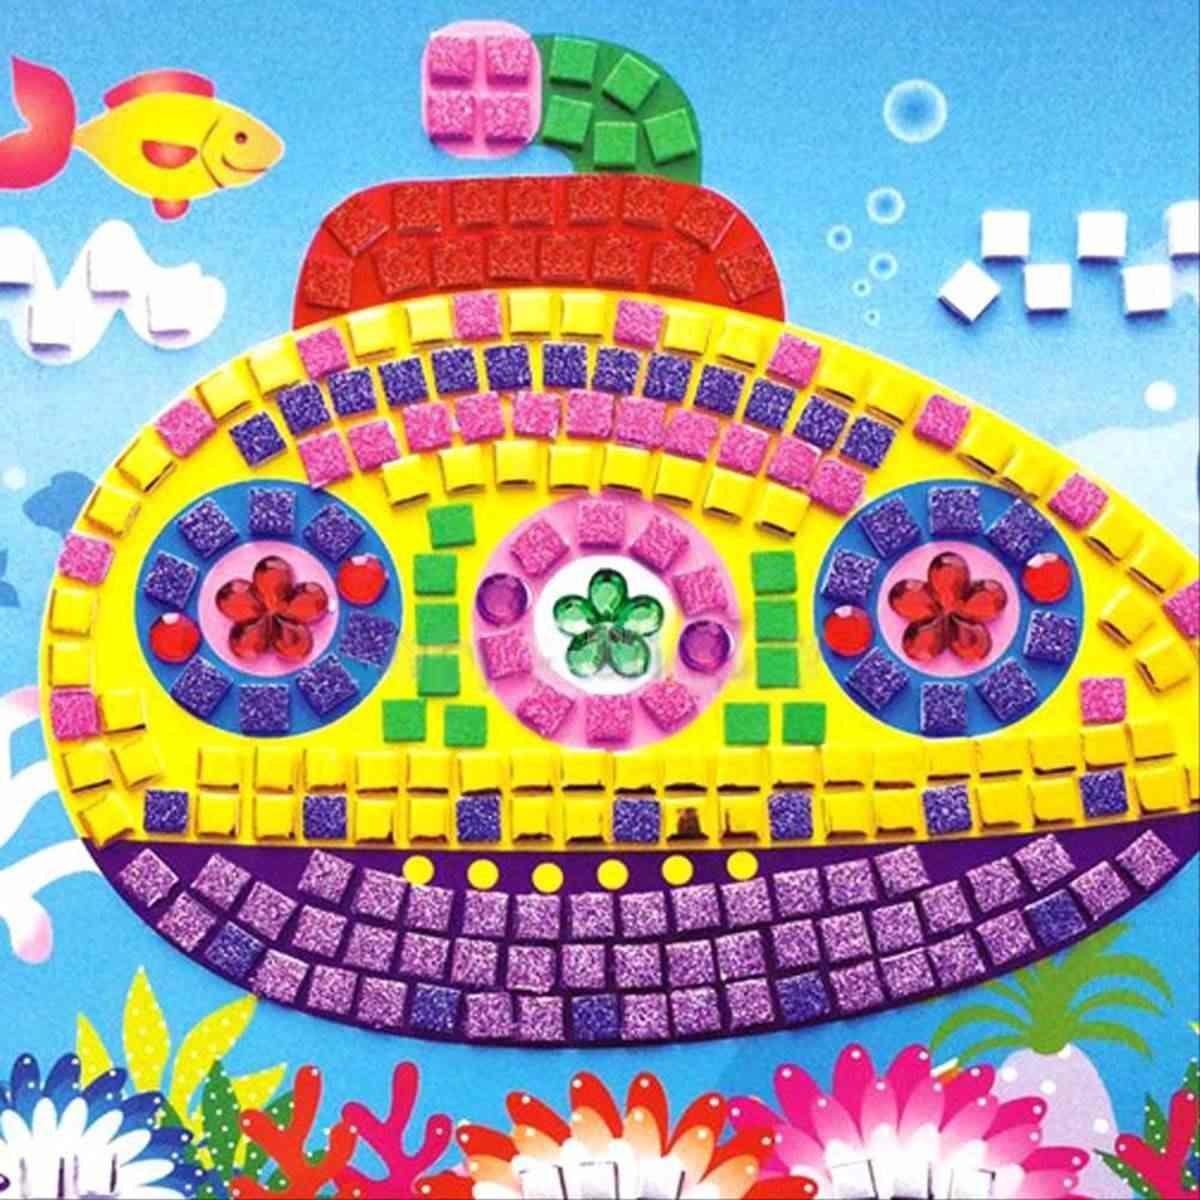 JIMITU EVA Cartoon 3D Foam Car Mosaics Art Stickers Painting Game  Multicolor Puzzle DIY Handmade Craft for Children Kids